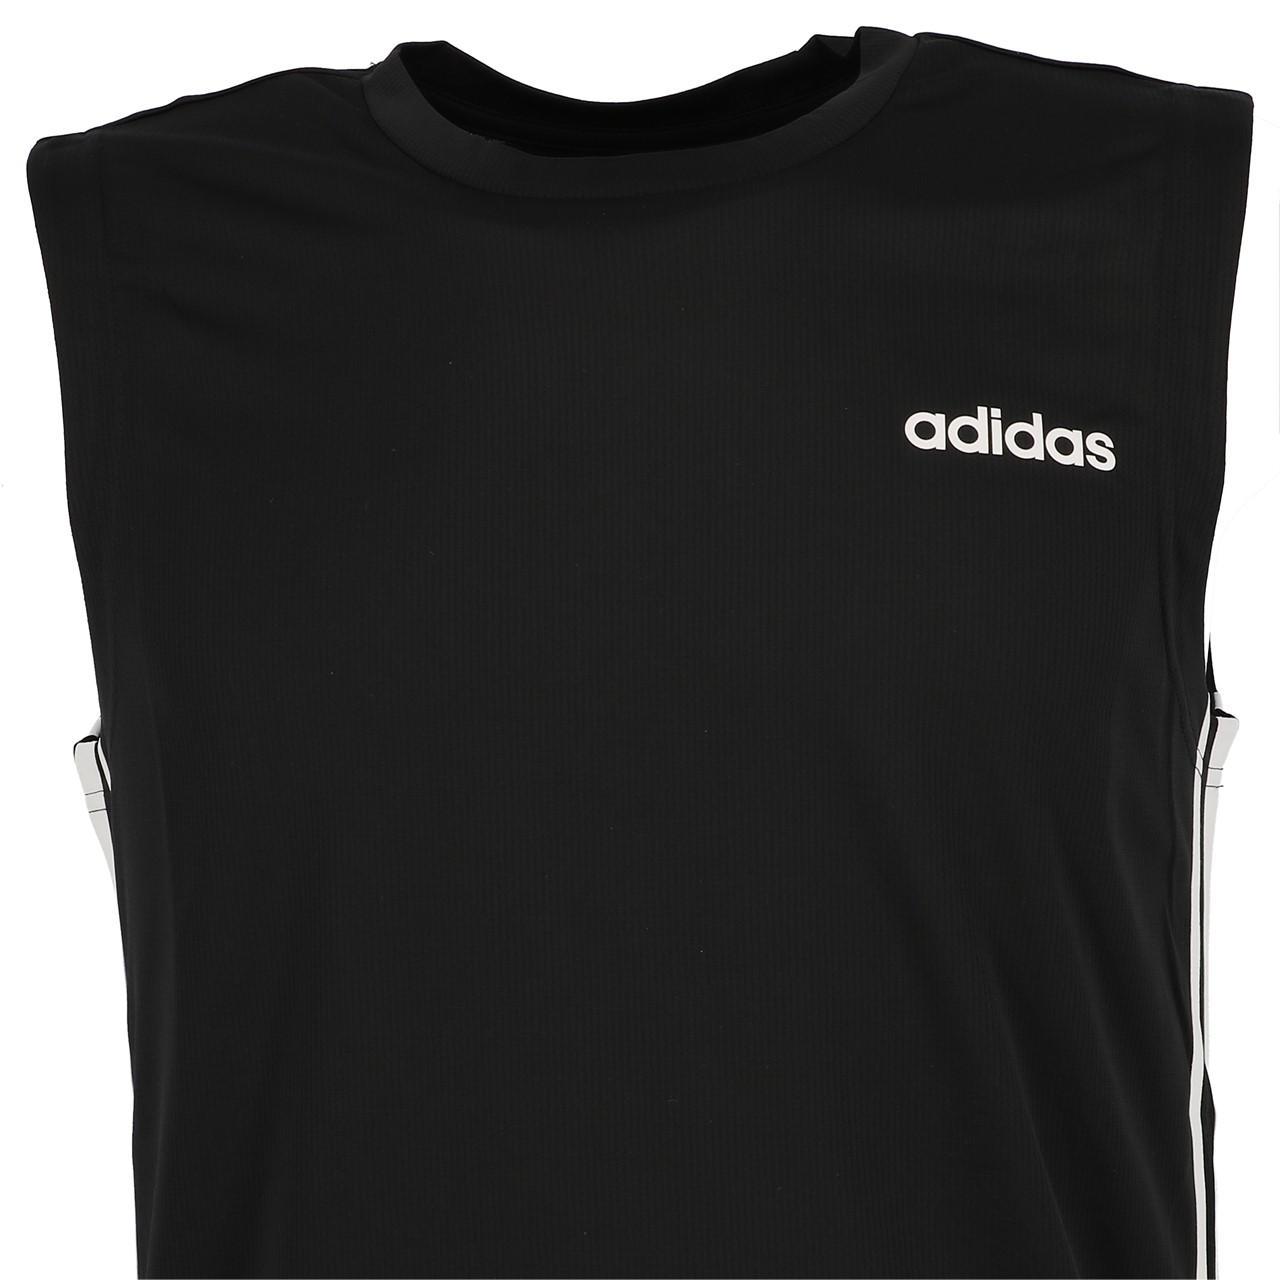 Sleeveless-Shirt-Adidas-D2m-Sl-3s-Blk-Sm-Tee-Black-90912-New thumbnail 2